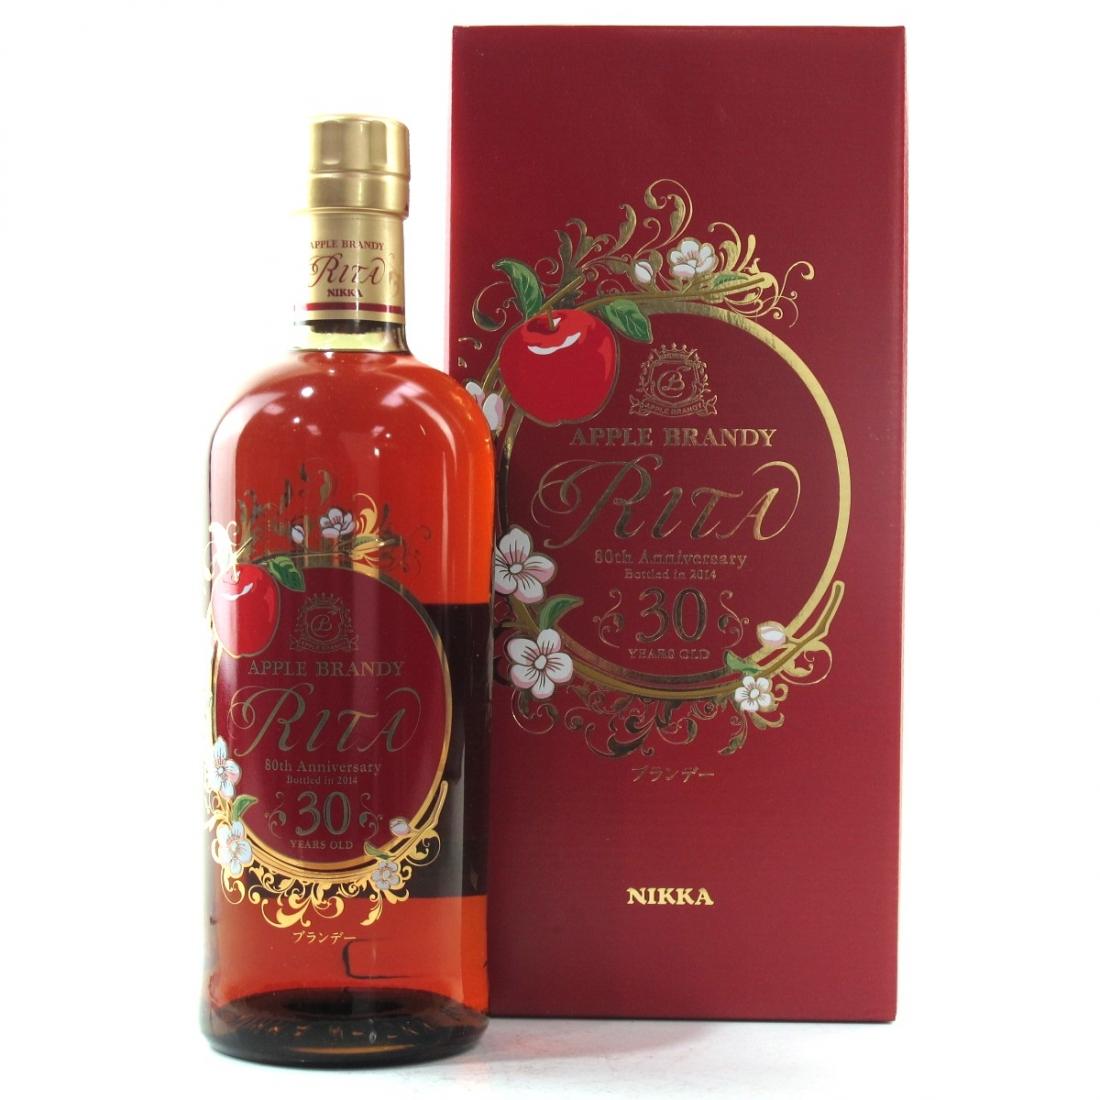 Nikka Rita 30 Year Old Apple Brandy 80th Anniversary